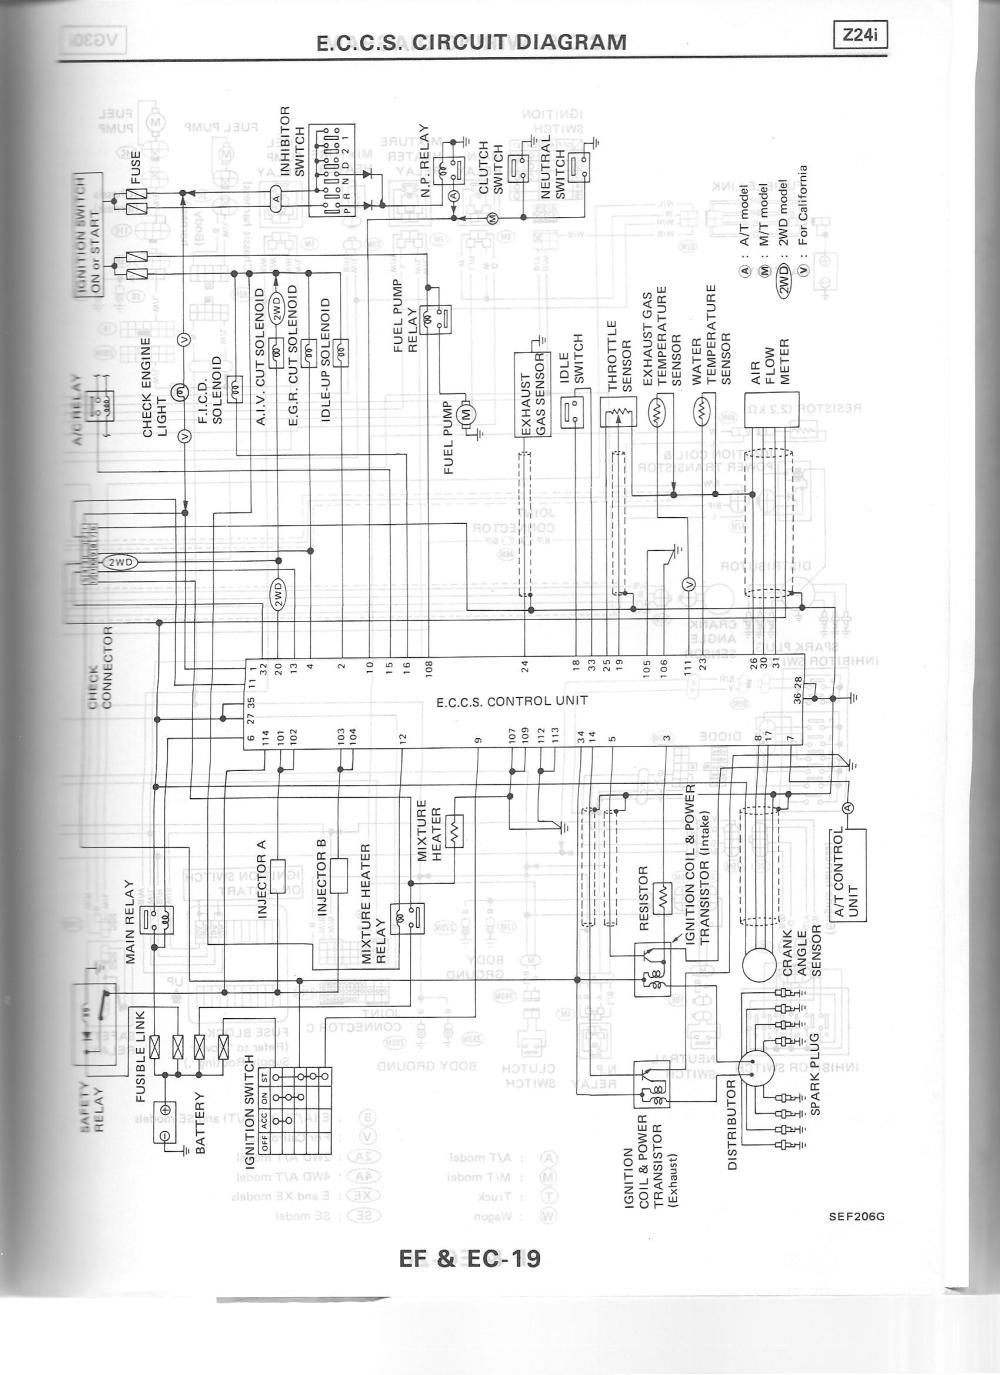 medium resolution of 1988 eccs wiring